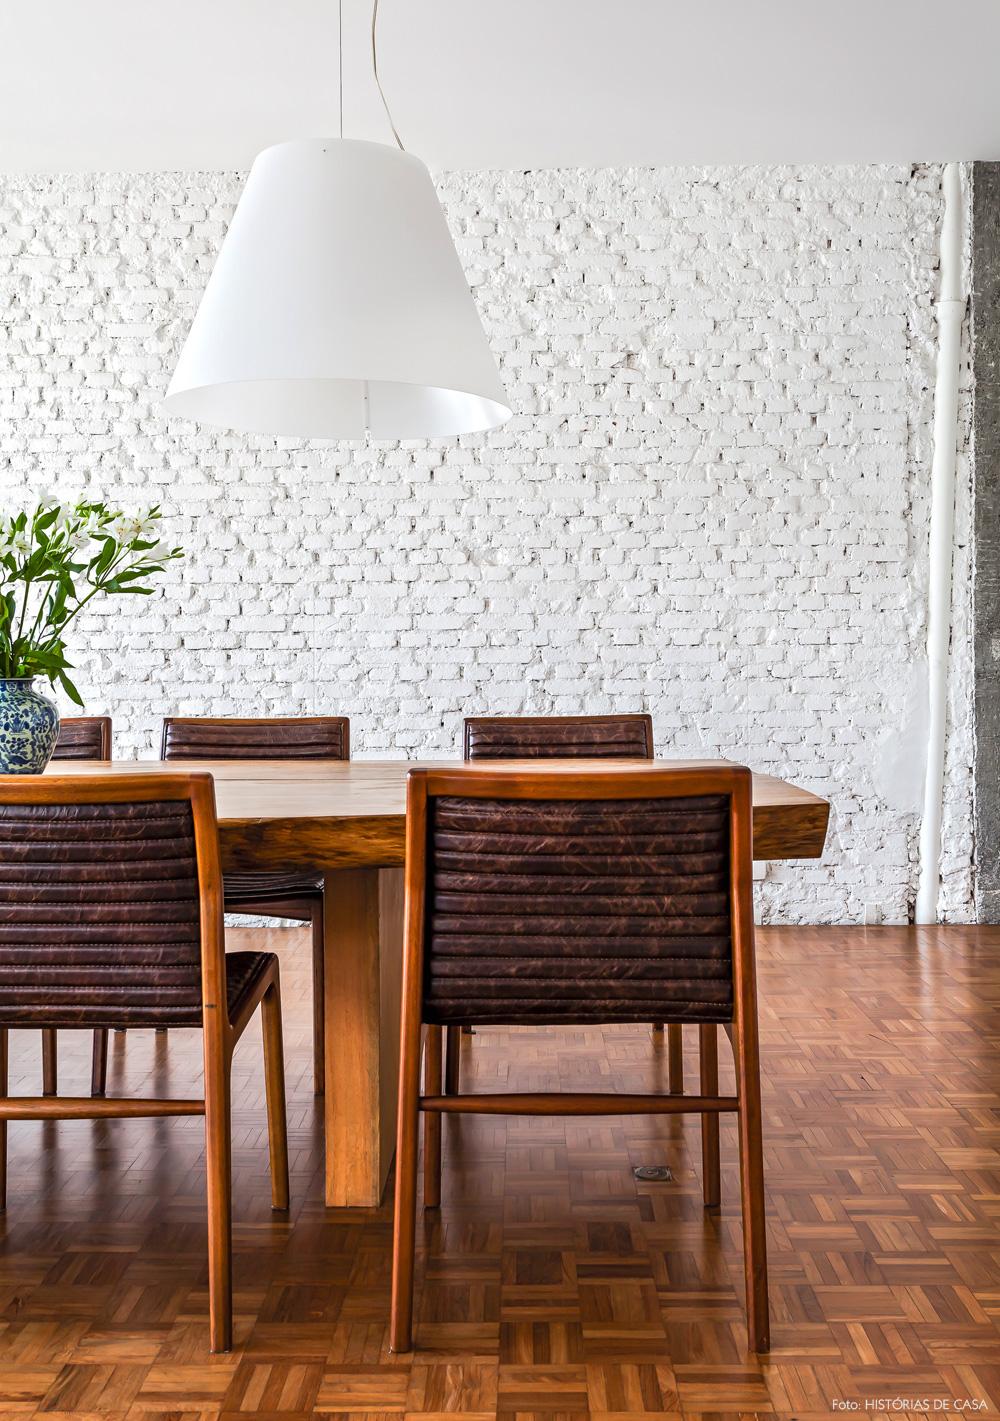 19-decoracao-sala-de-jantar-tijolinho-branco-mesa-rustica